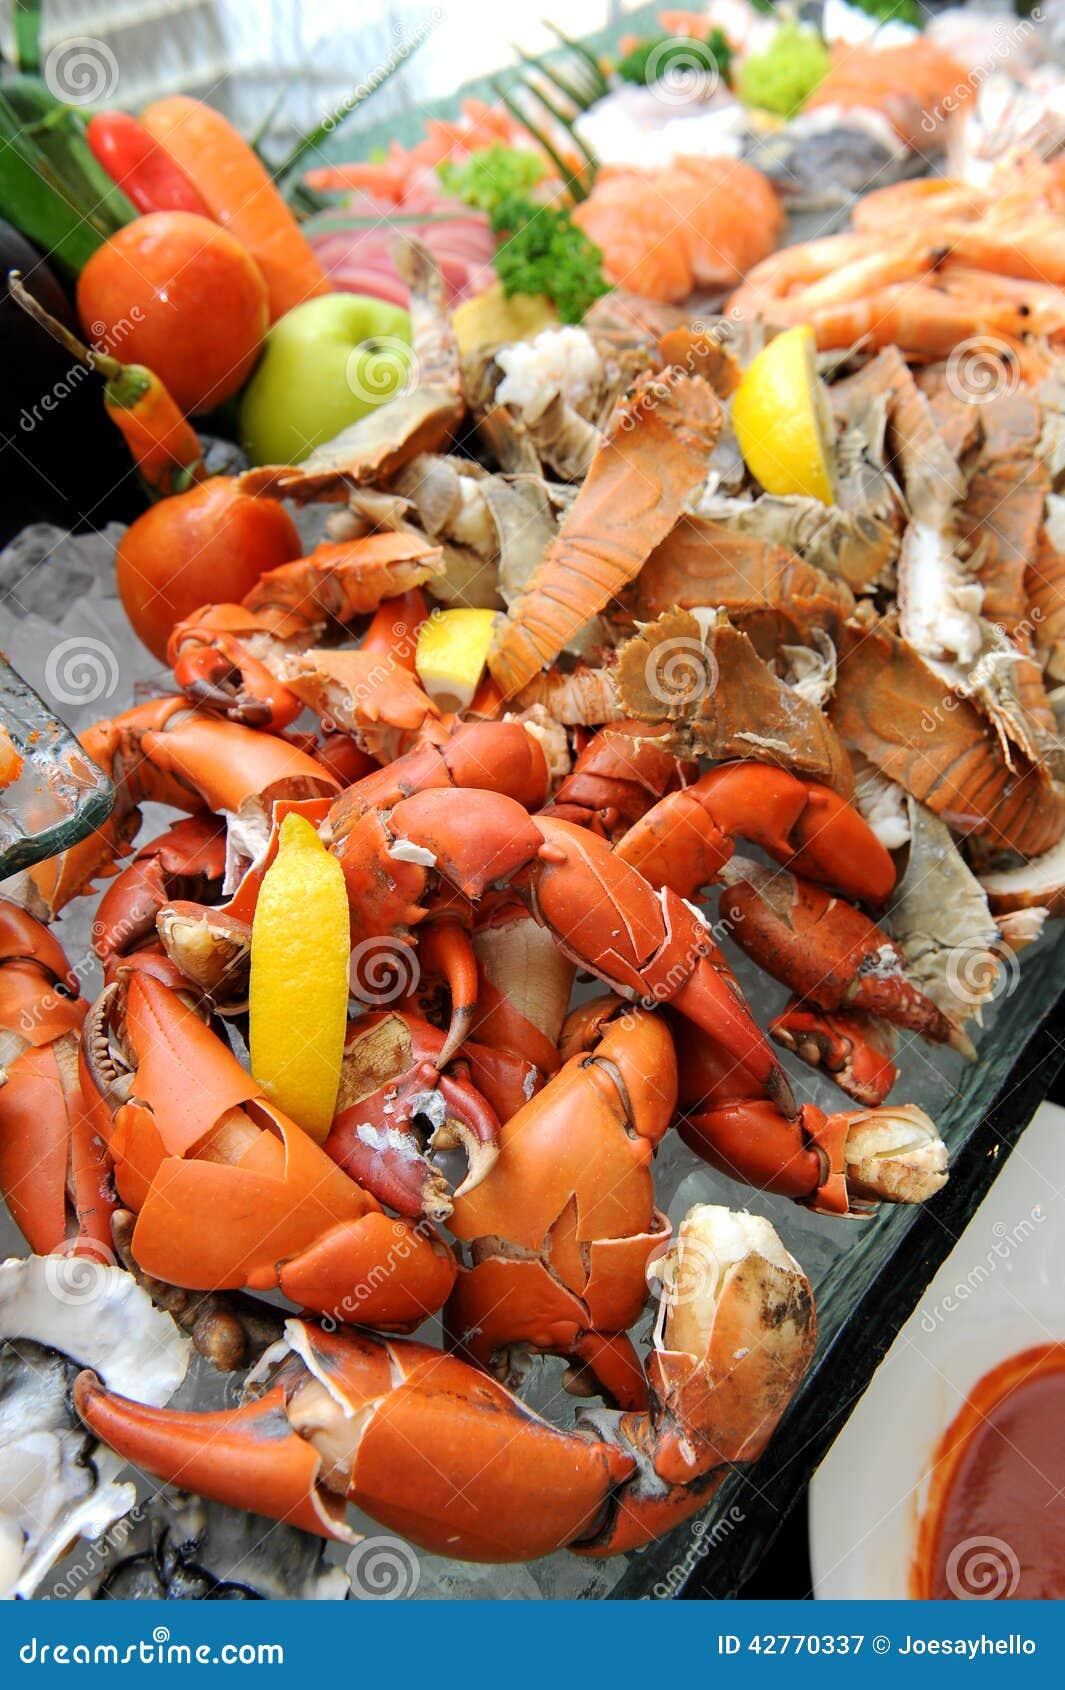 Stream Crab Legs Fresh Seafood Stock Image - Image of ...